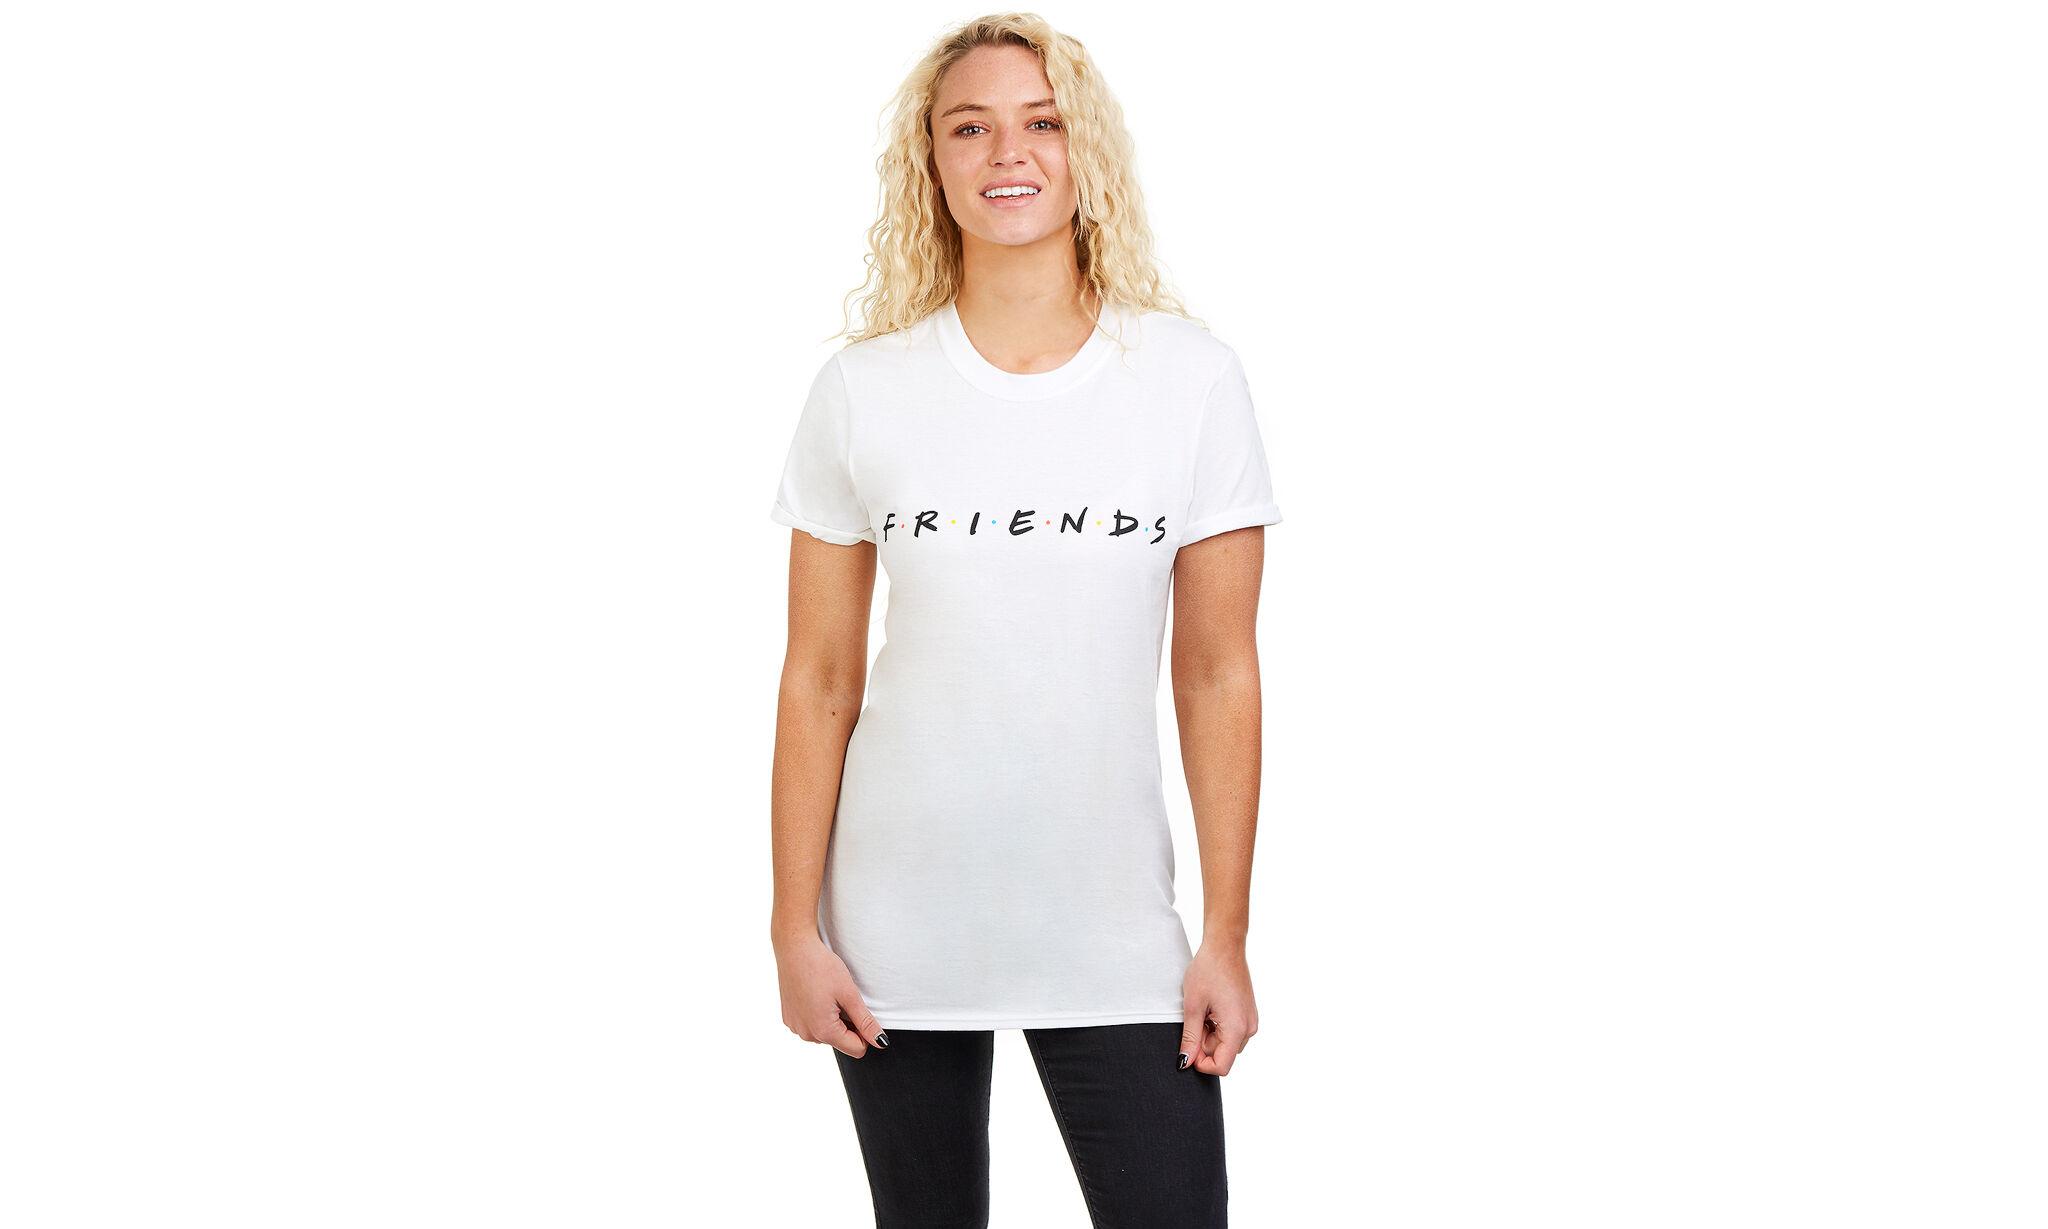 Friends Women's T-Shirt: Titles - White/Size XL